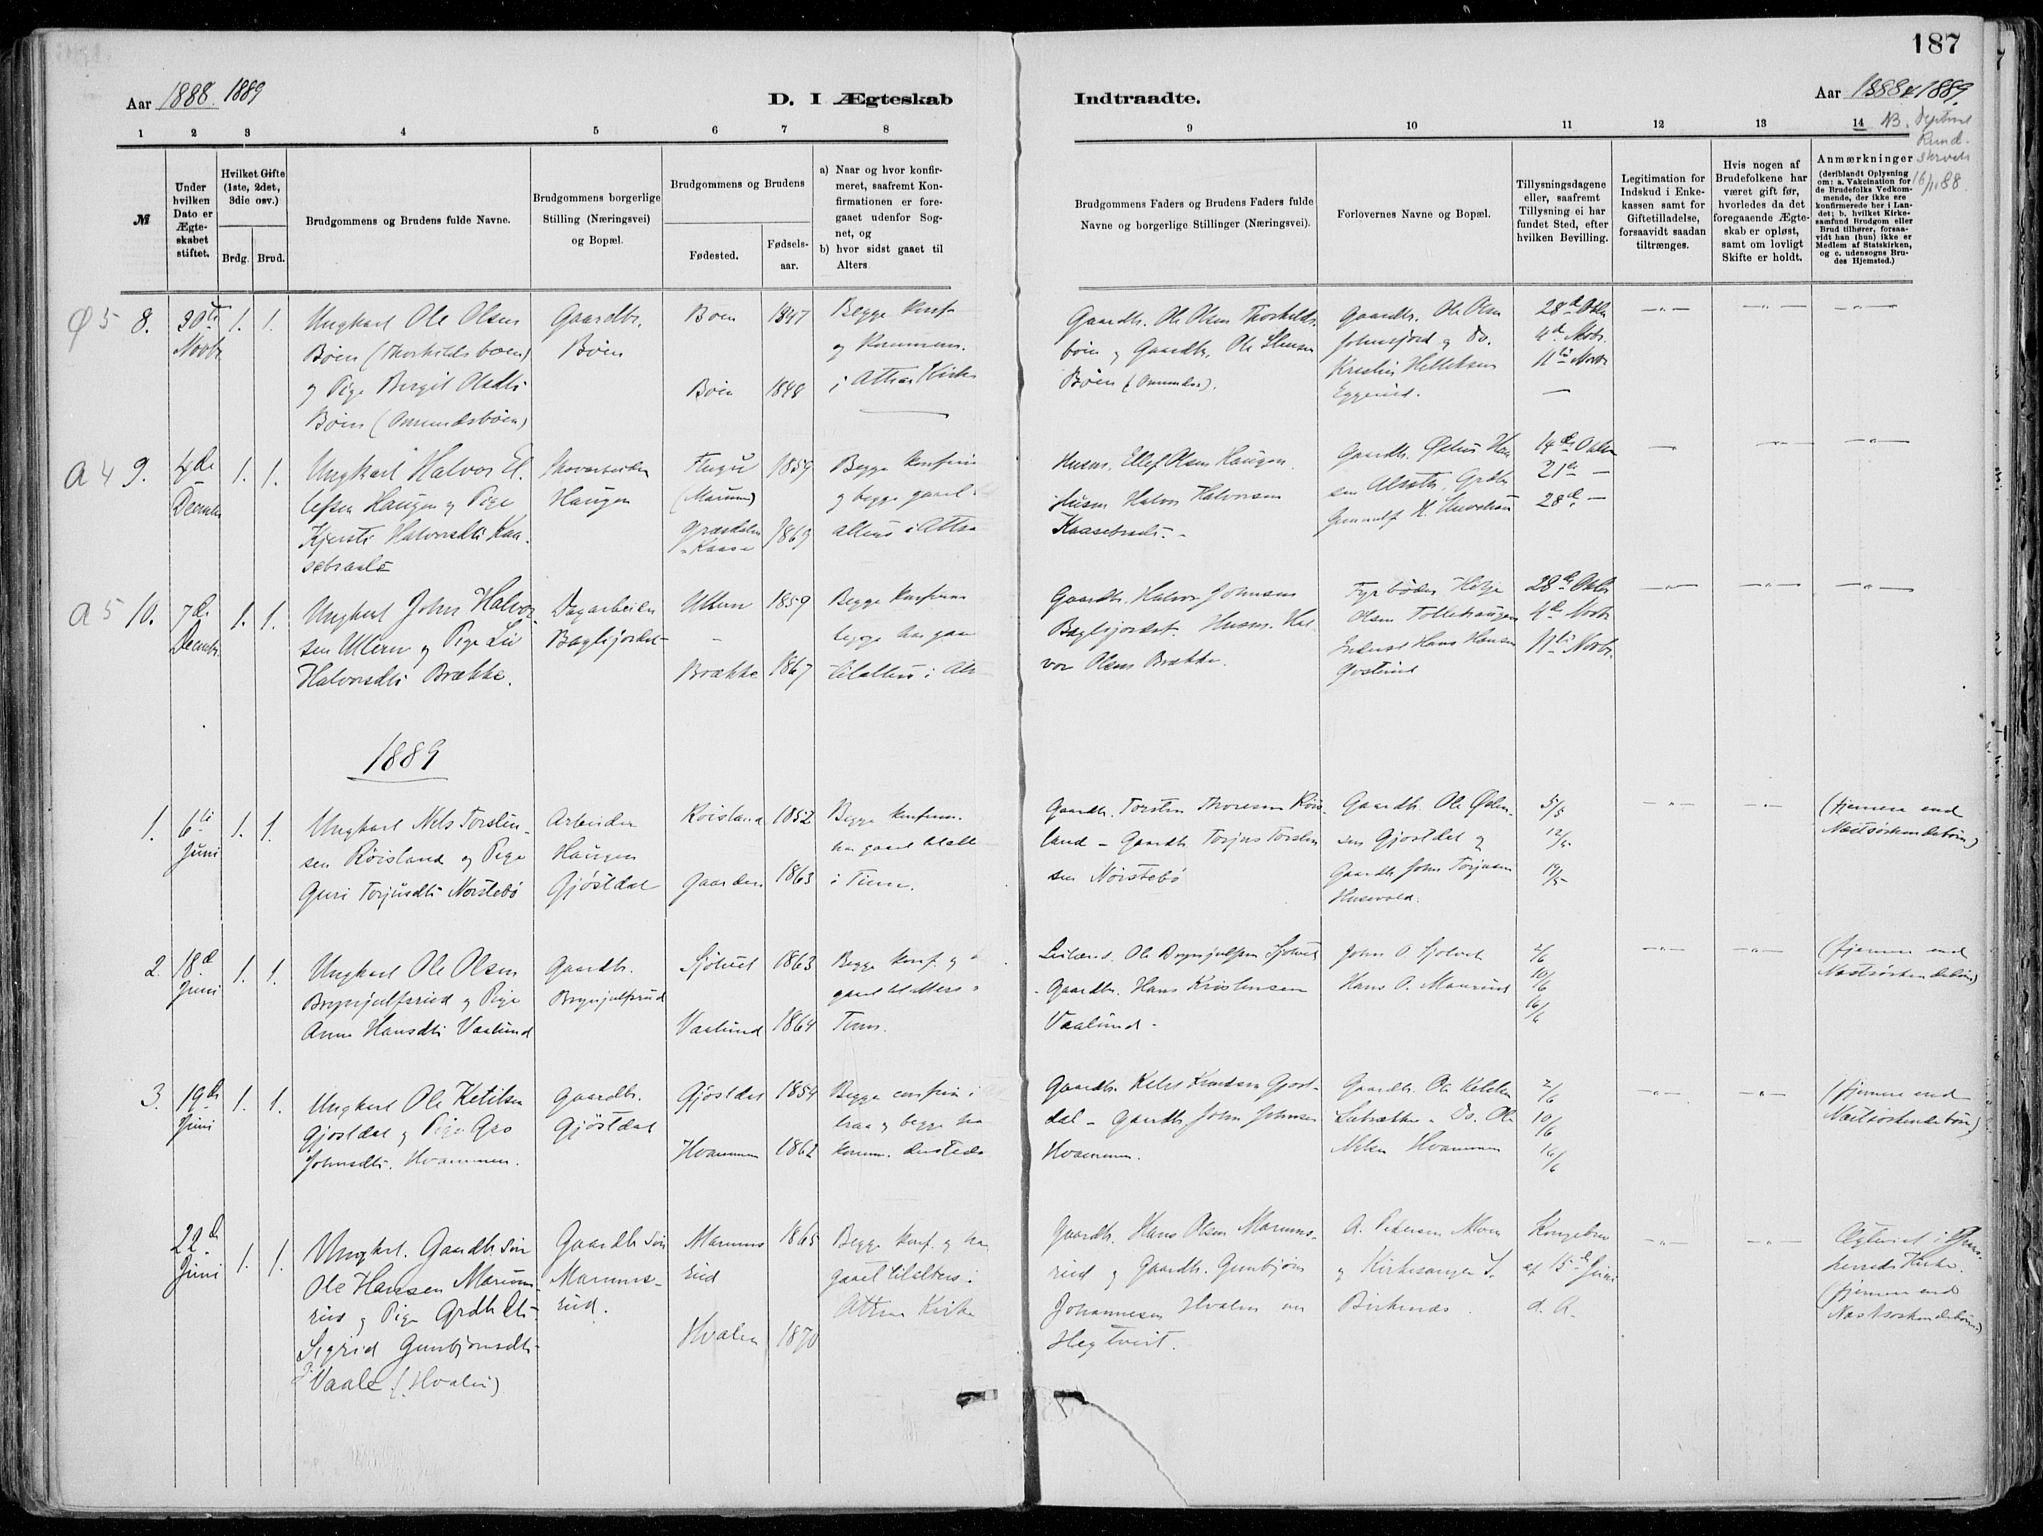 SAKO, Tinn kirkebøker, F/Fa/L0007: Ministerialbok nr. I 7, 1878-1922, s. 187